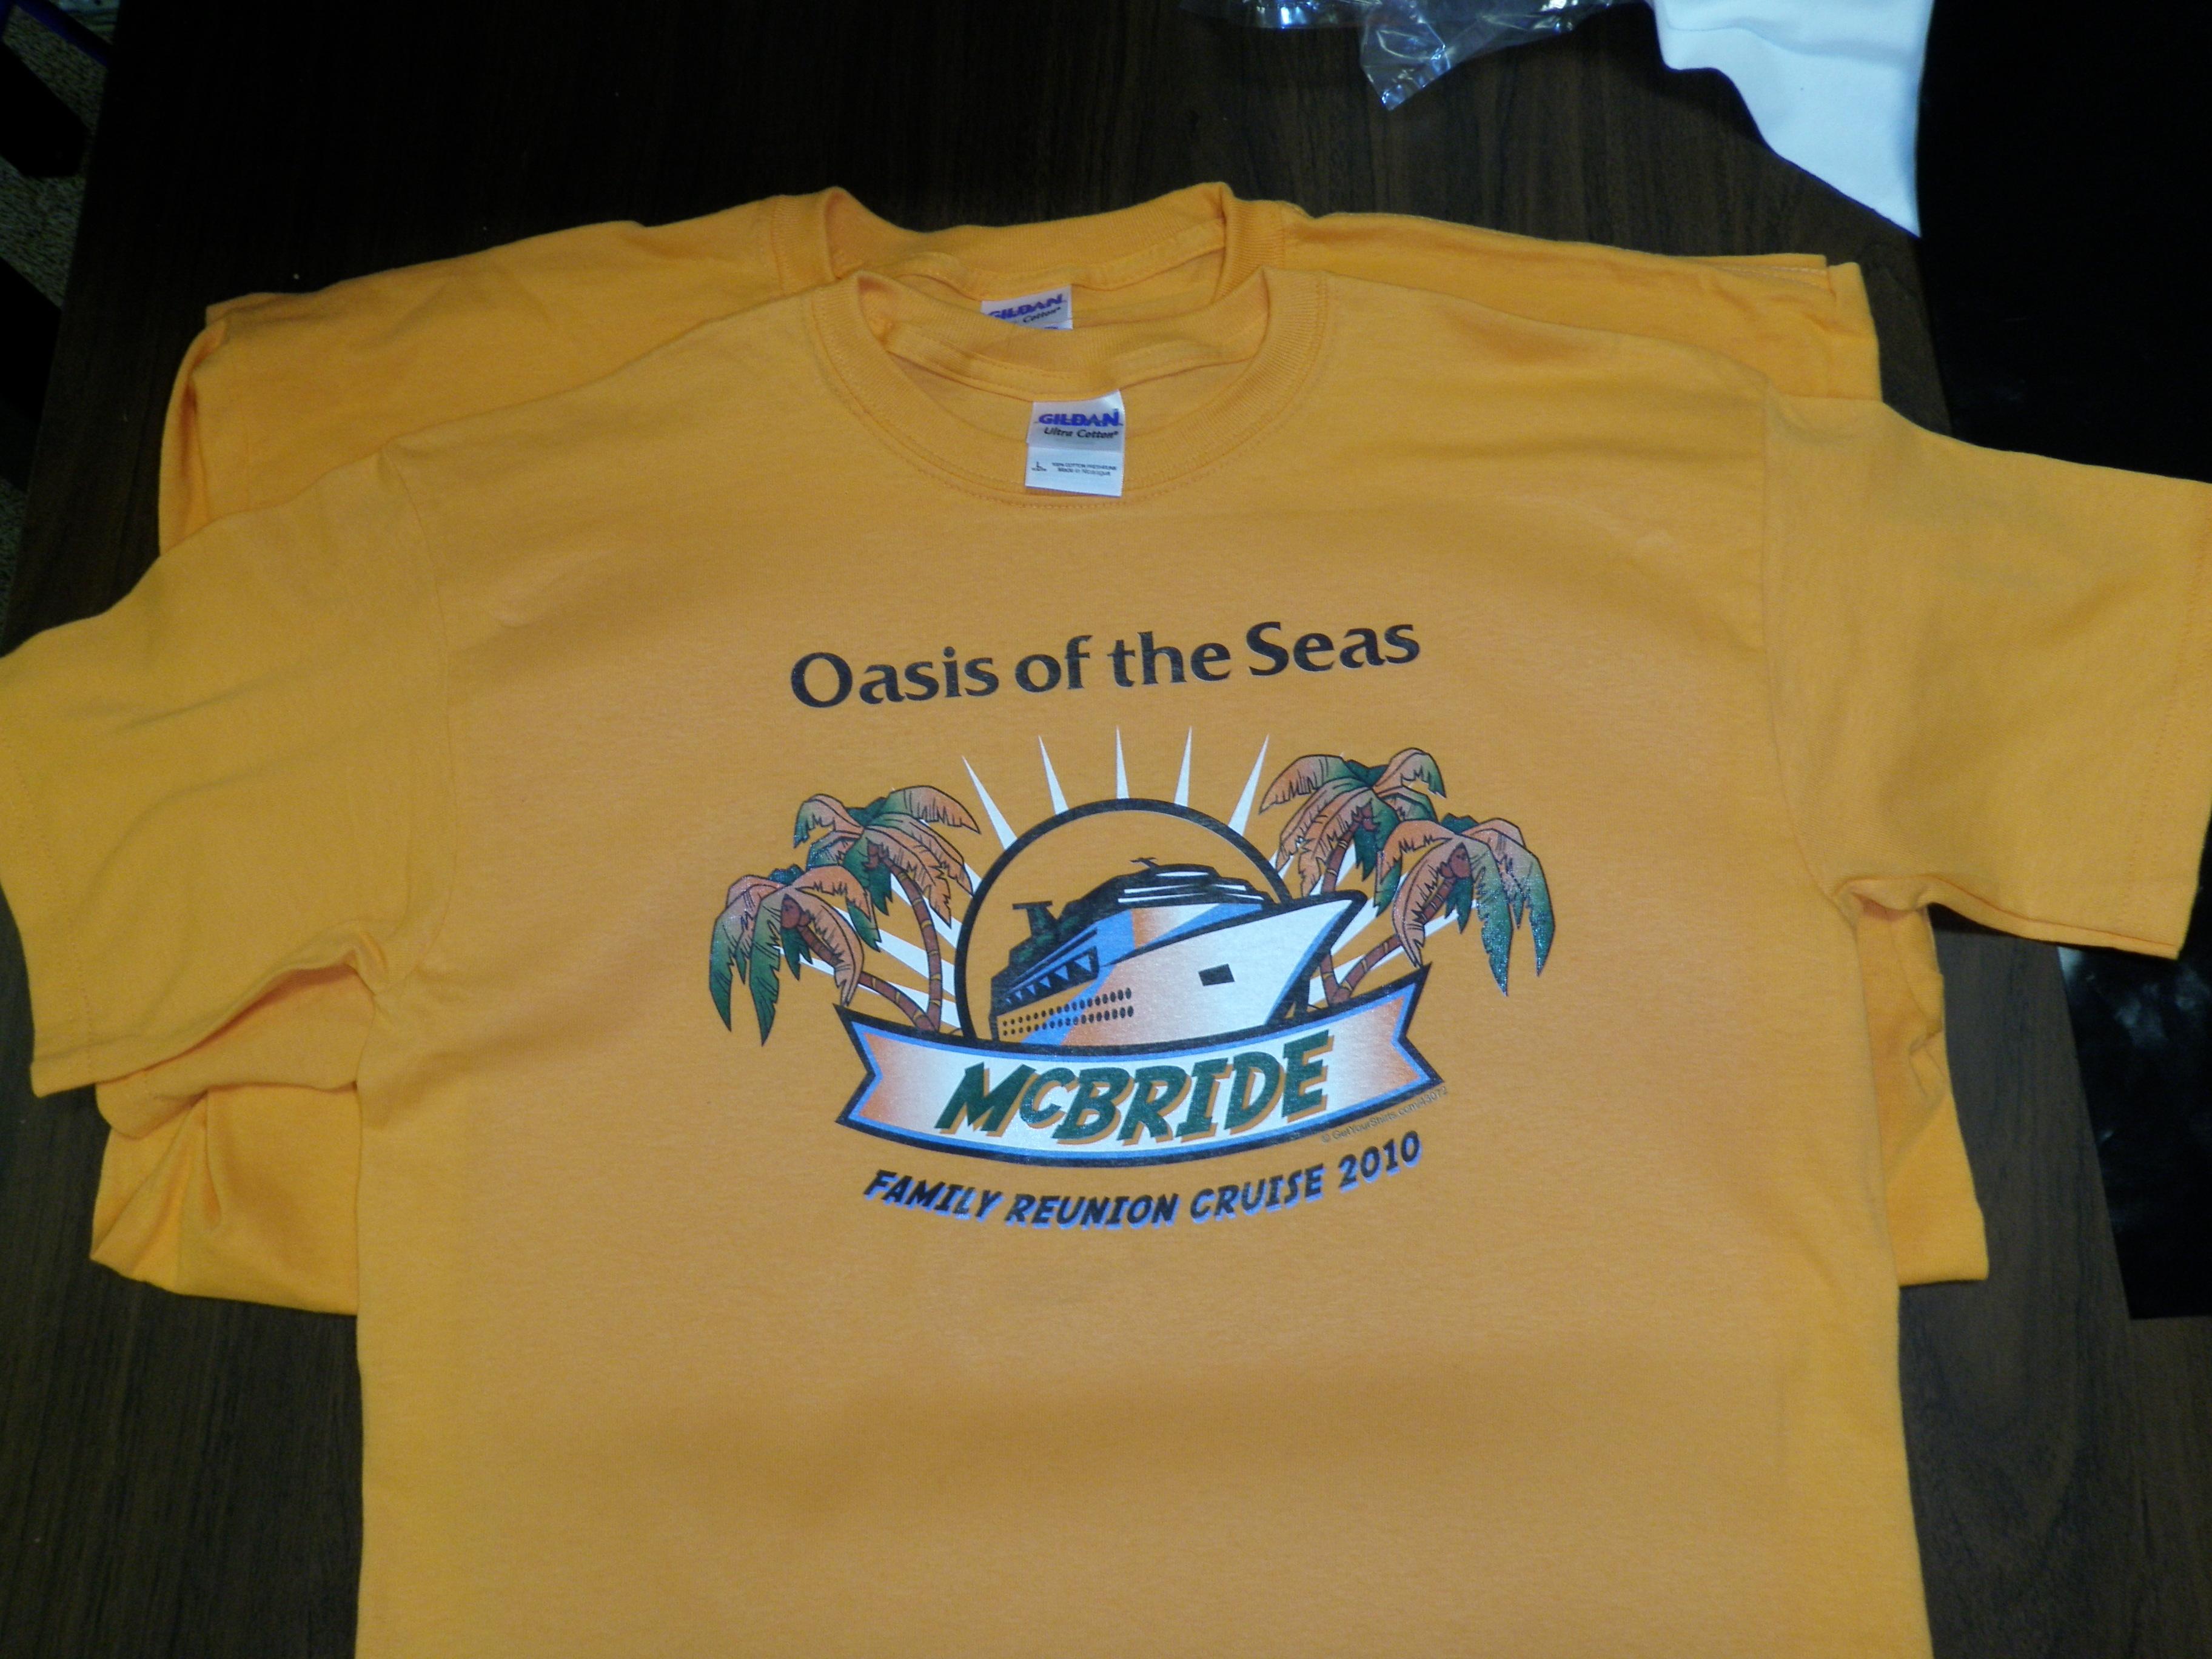 425c5991 New Digital Printing: Single T-shirt orders now possible! - ClassB ...